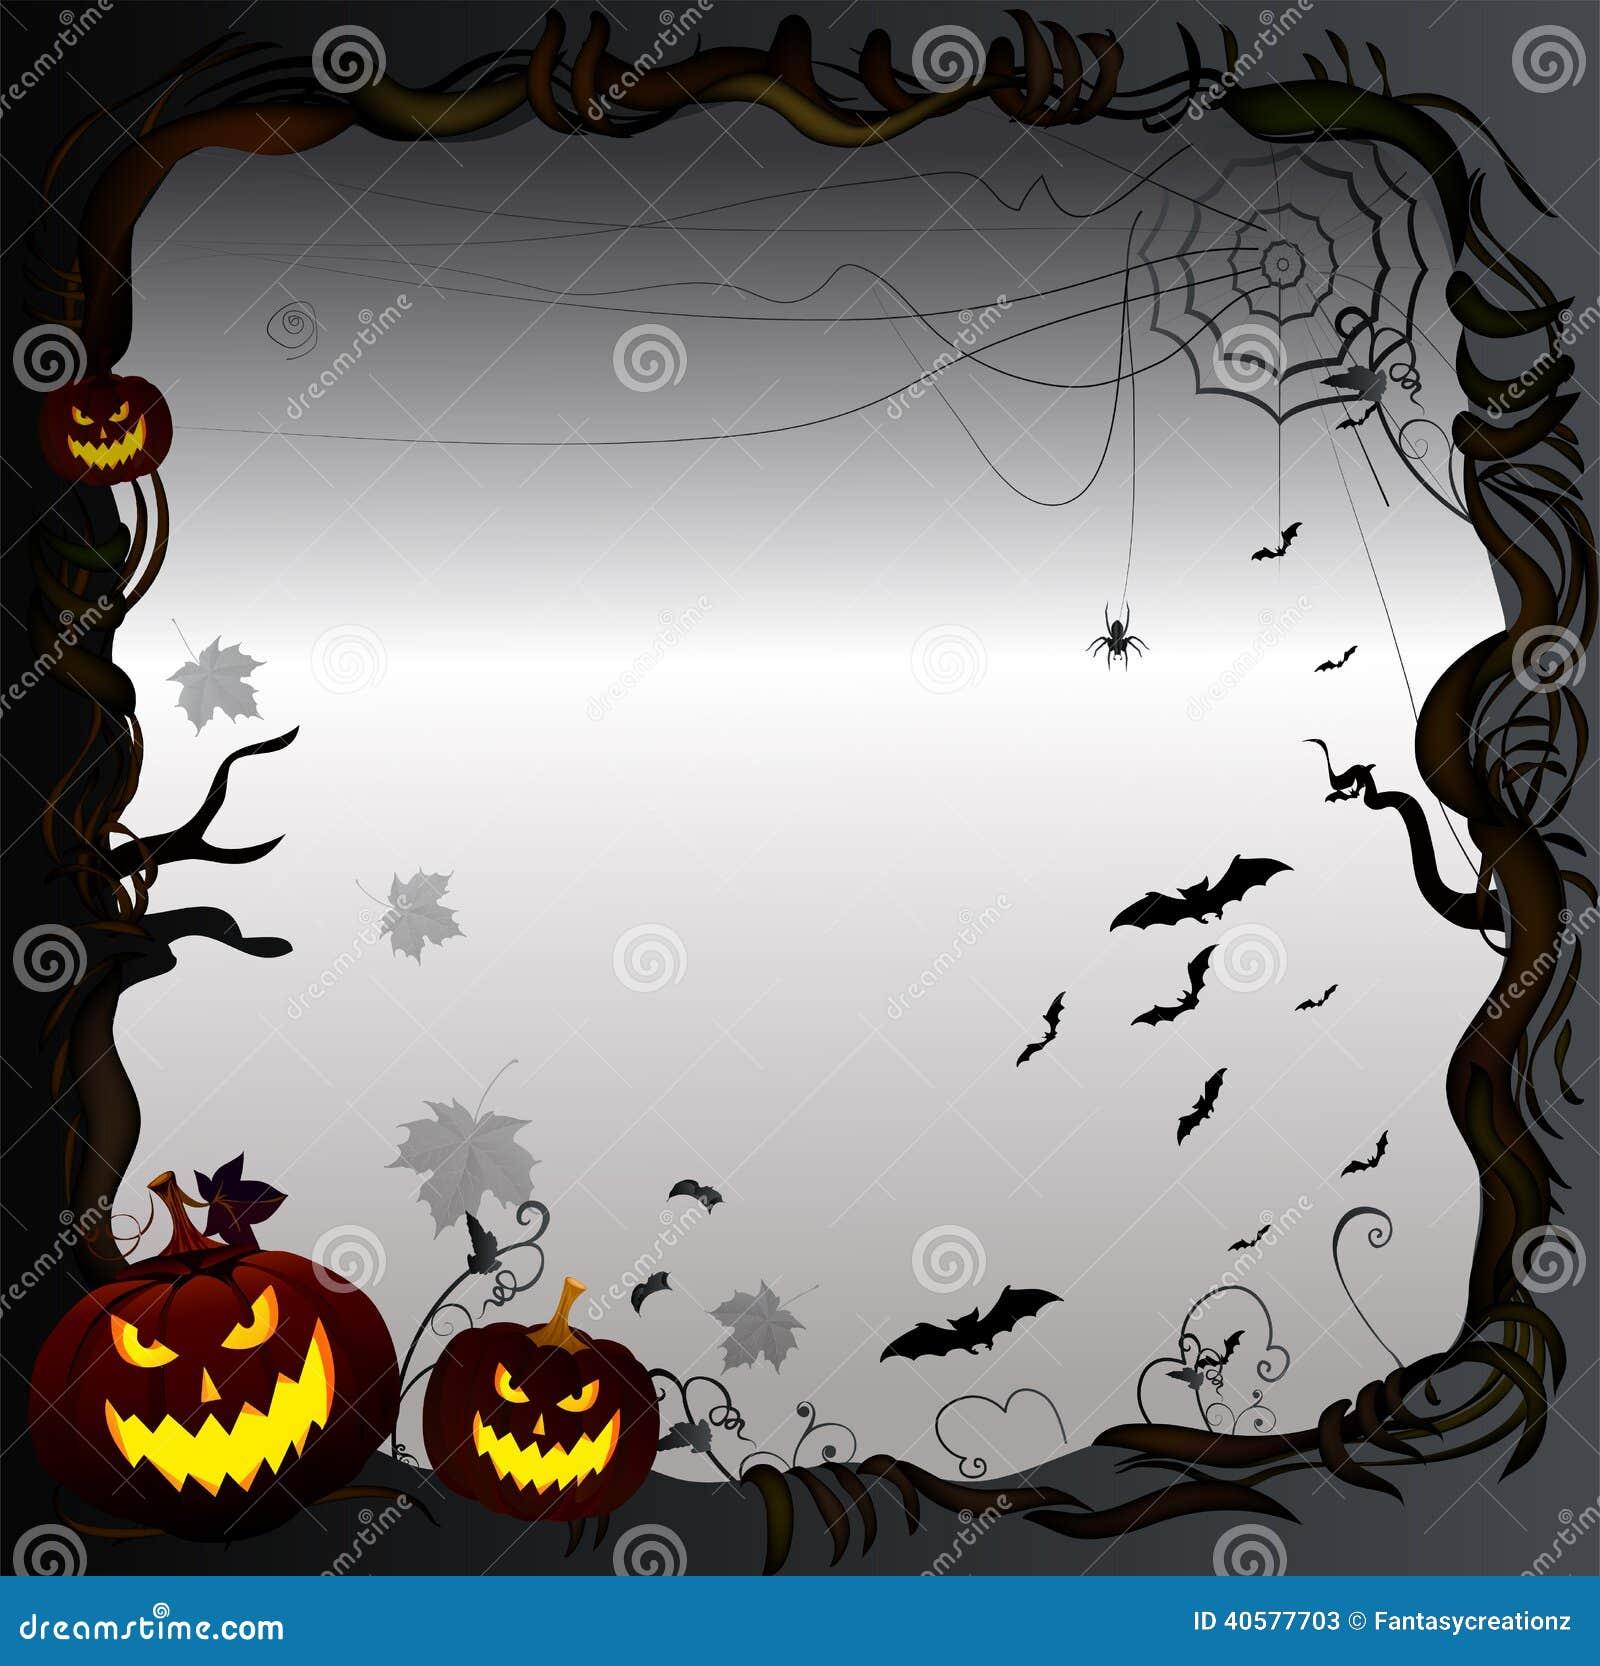 halloween frame background. stock vector - illustration of